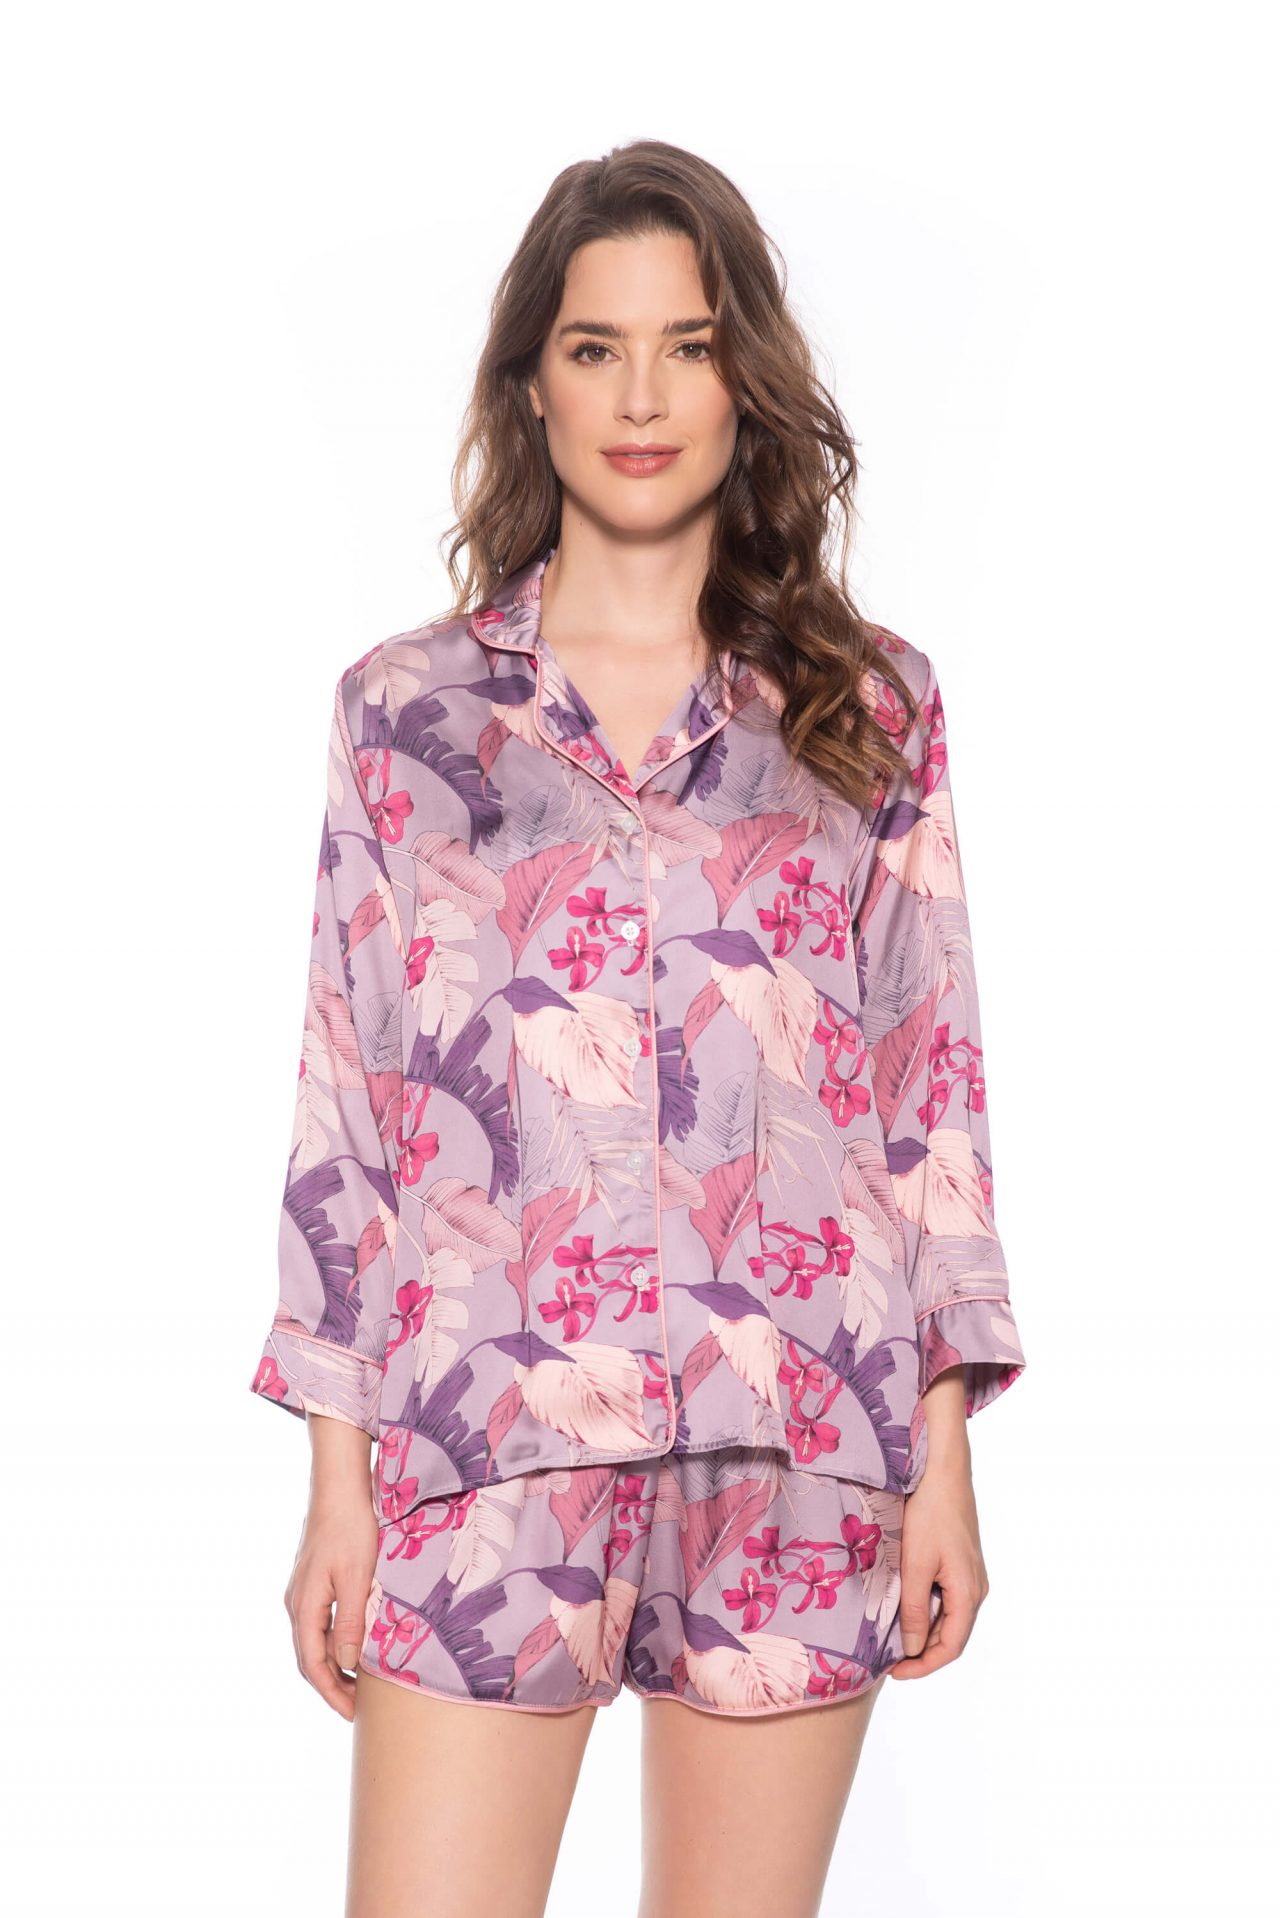 Pijama Palmetto Short Livenza en Atizz